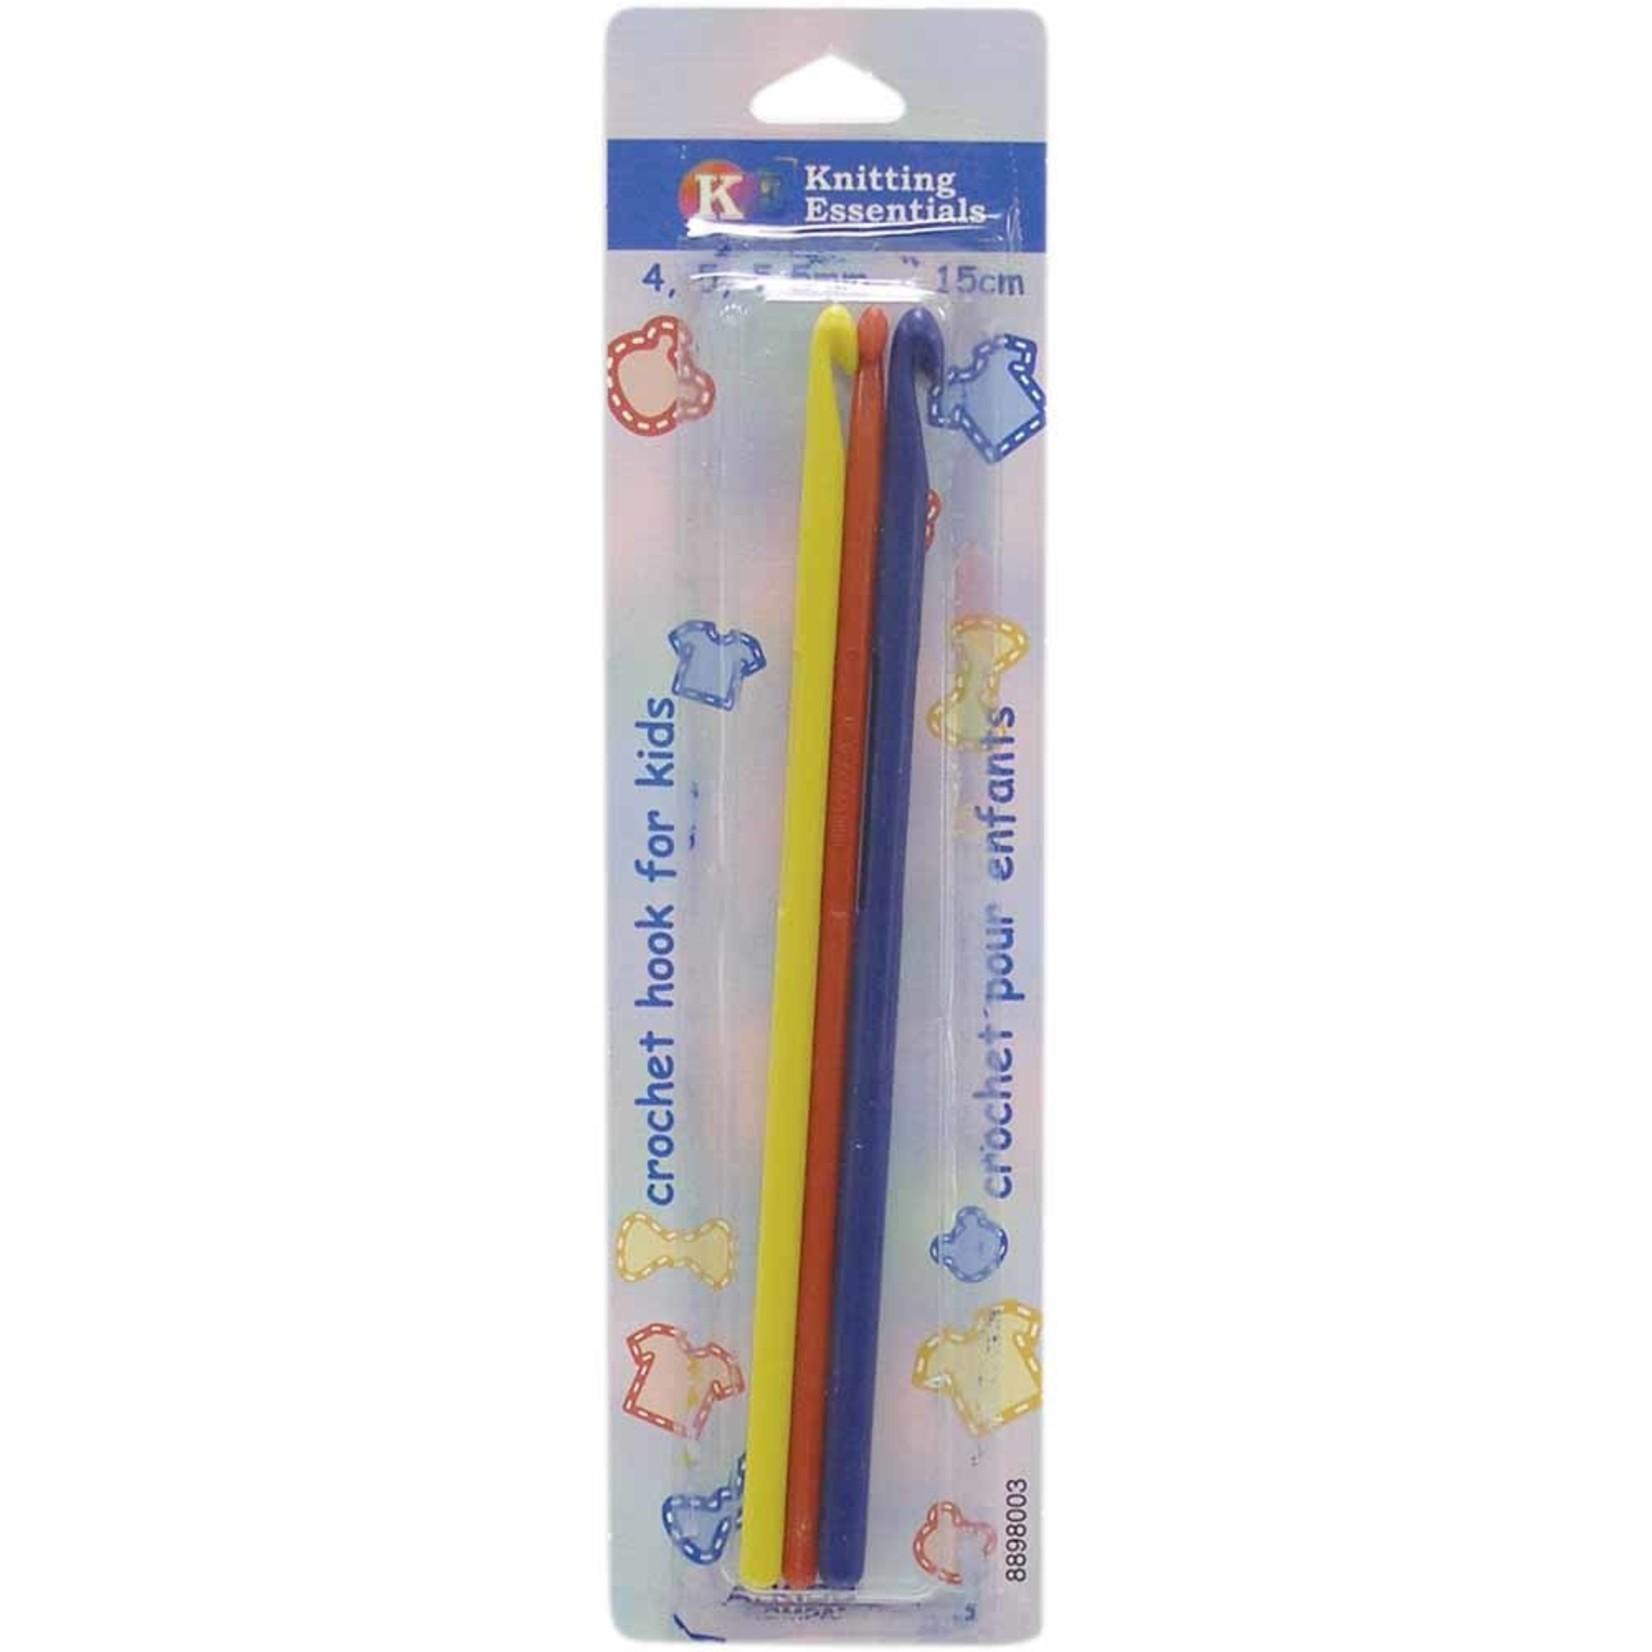 "Knitting Essentials Kids 15cm (6"") Crochet Hooks by KNITTING ESSENTIALS"